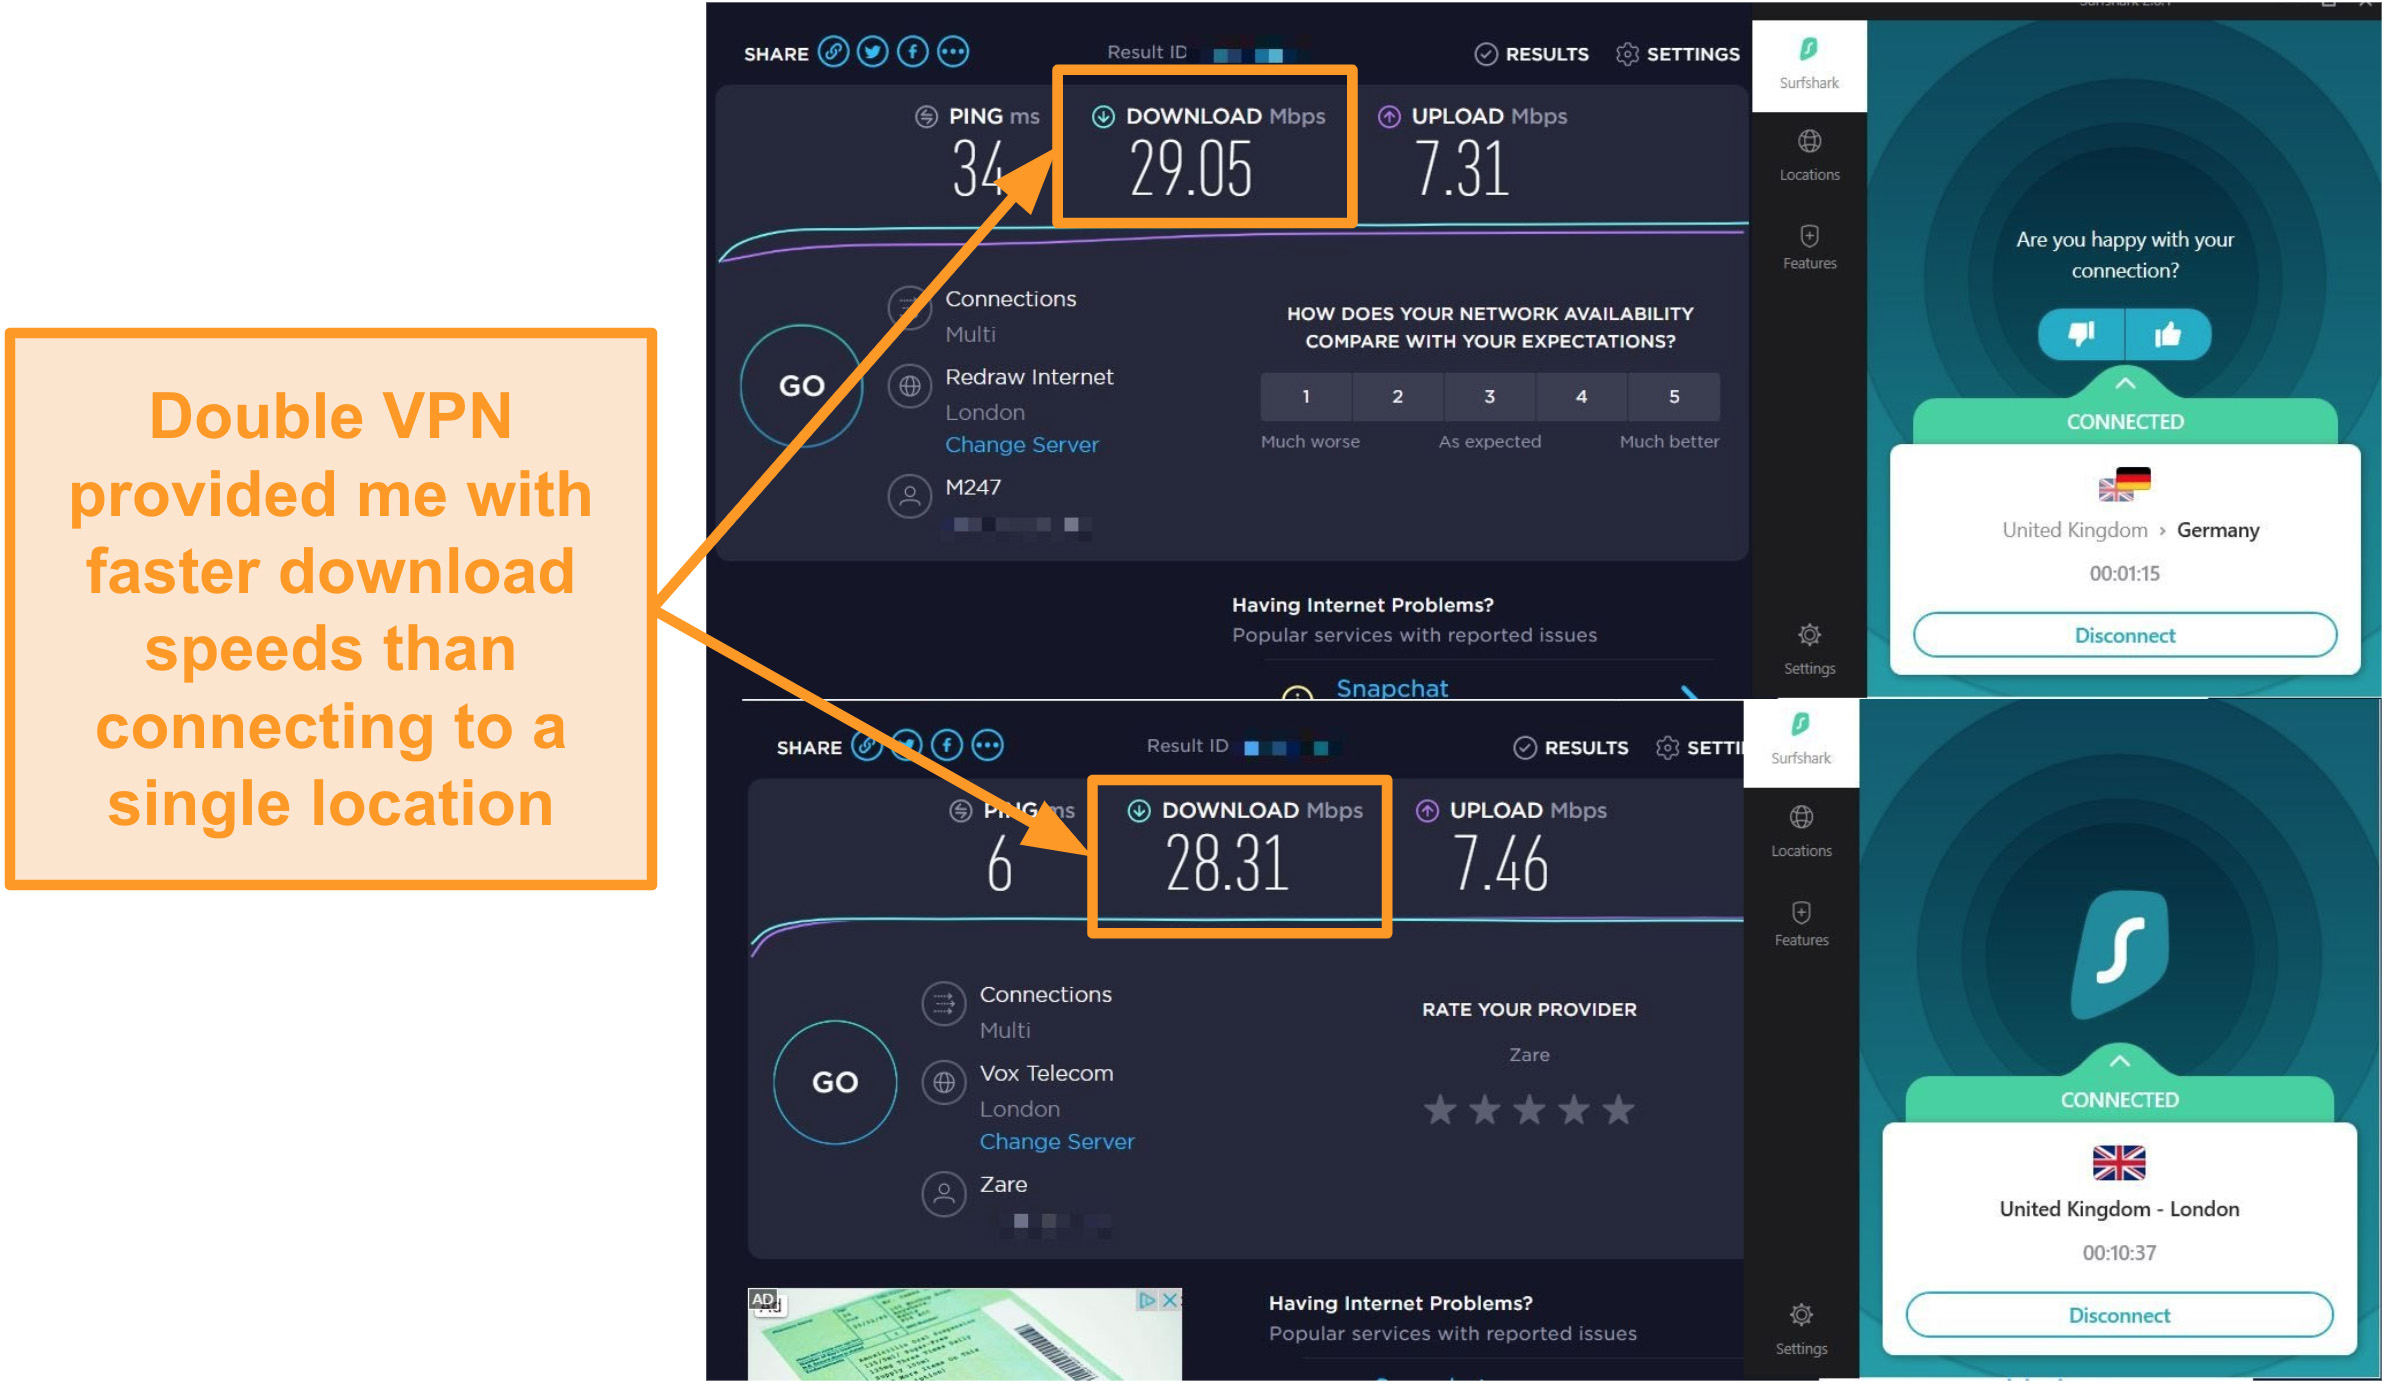 Screenshot of Surfshak speed comparison